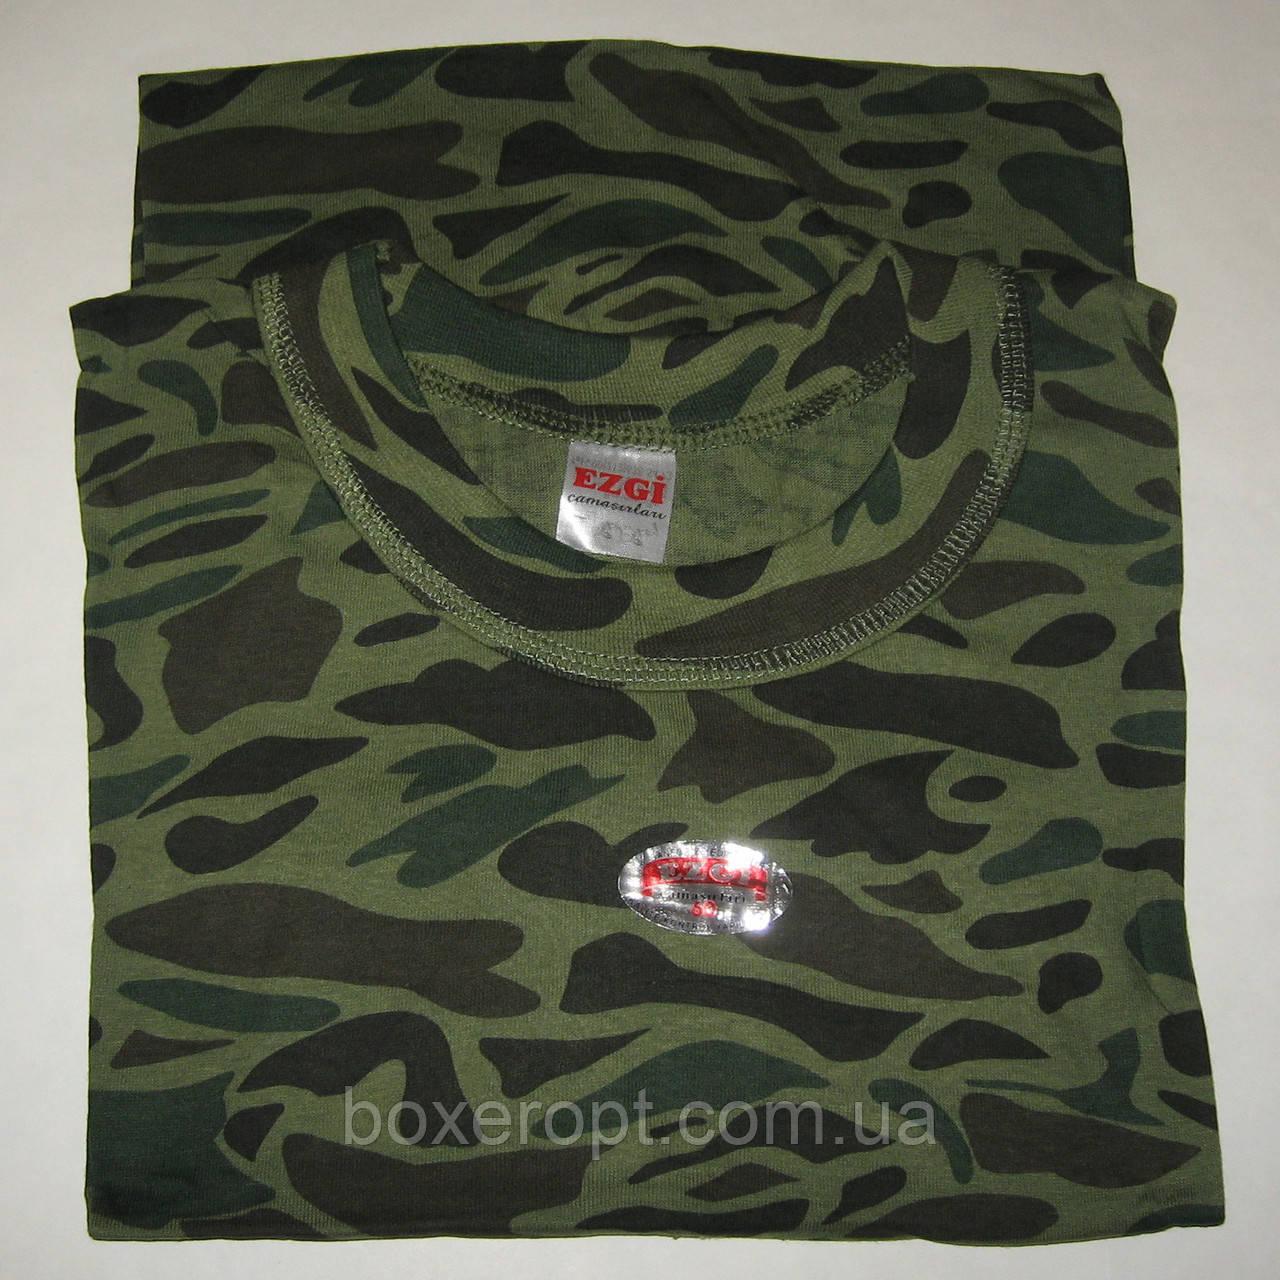 Мужские футболки Ezgi - 45.00 грн./шт. (56-й размер, хаки)